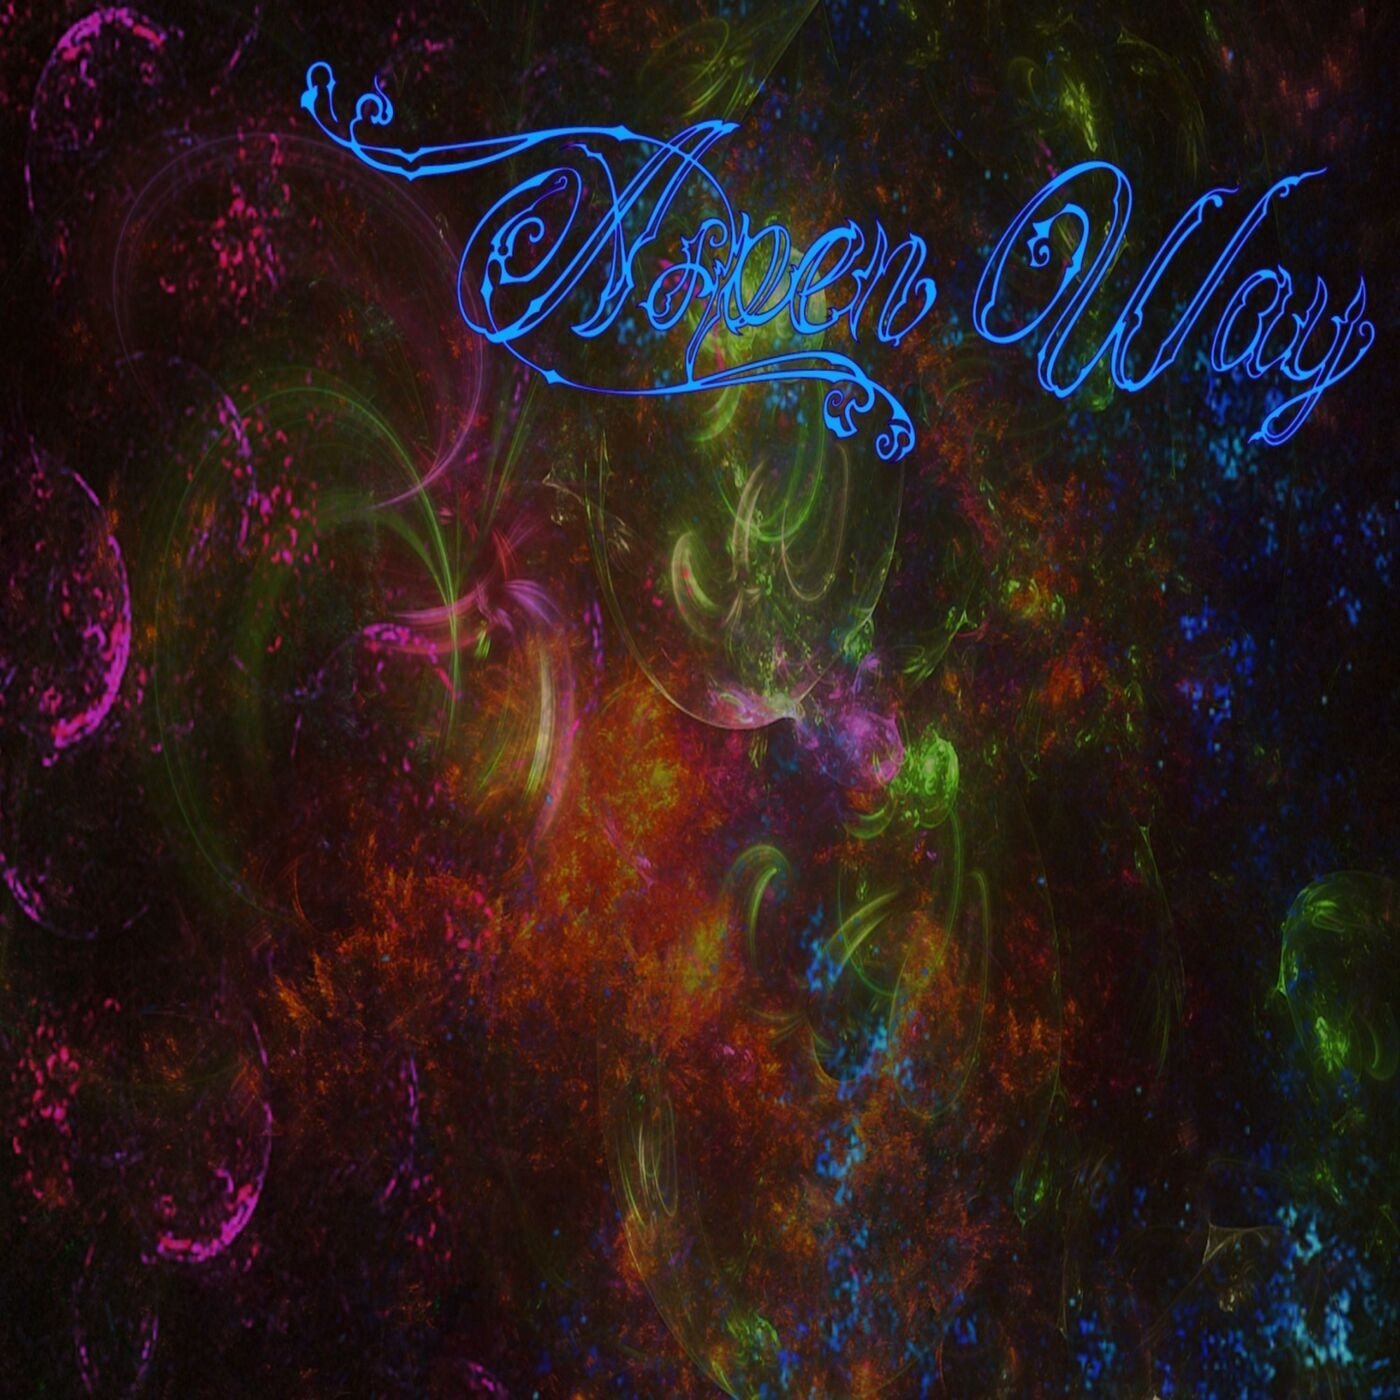 Aspen Way - Stand Still [single] (2019)